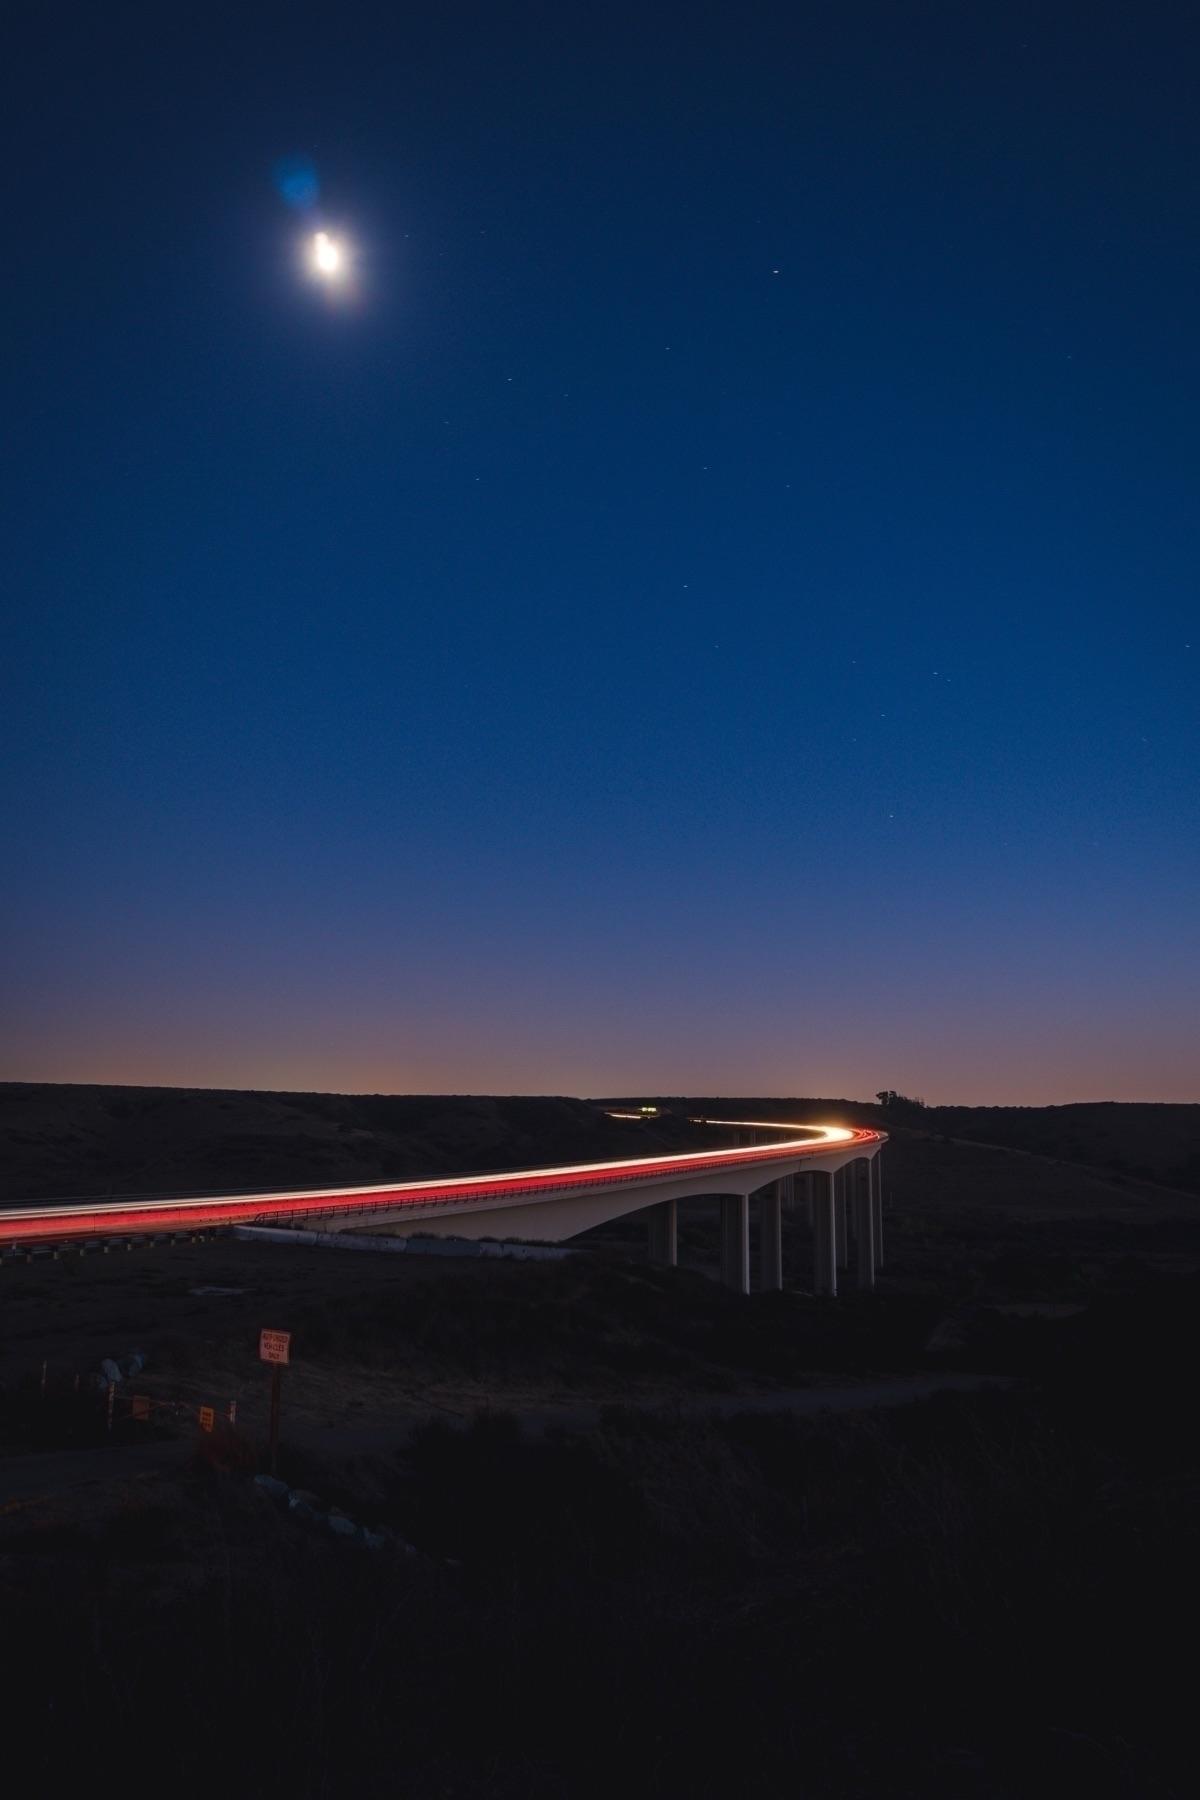 moon guide - photography, digitalphotography - donsergio   ello